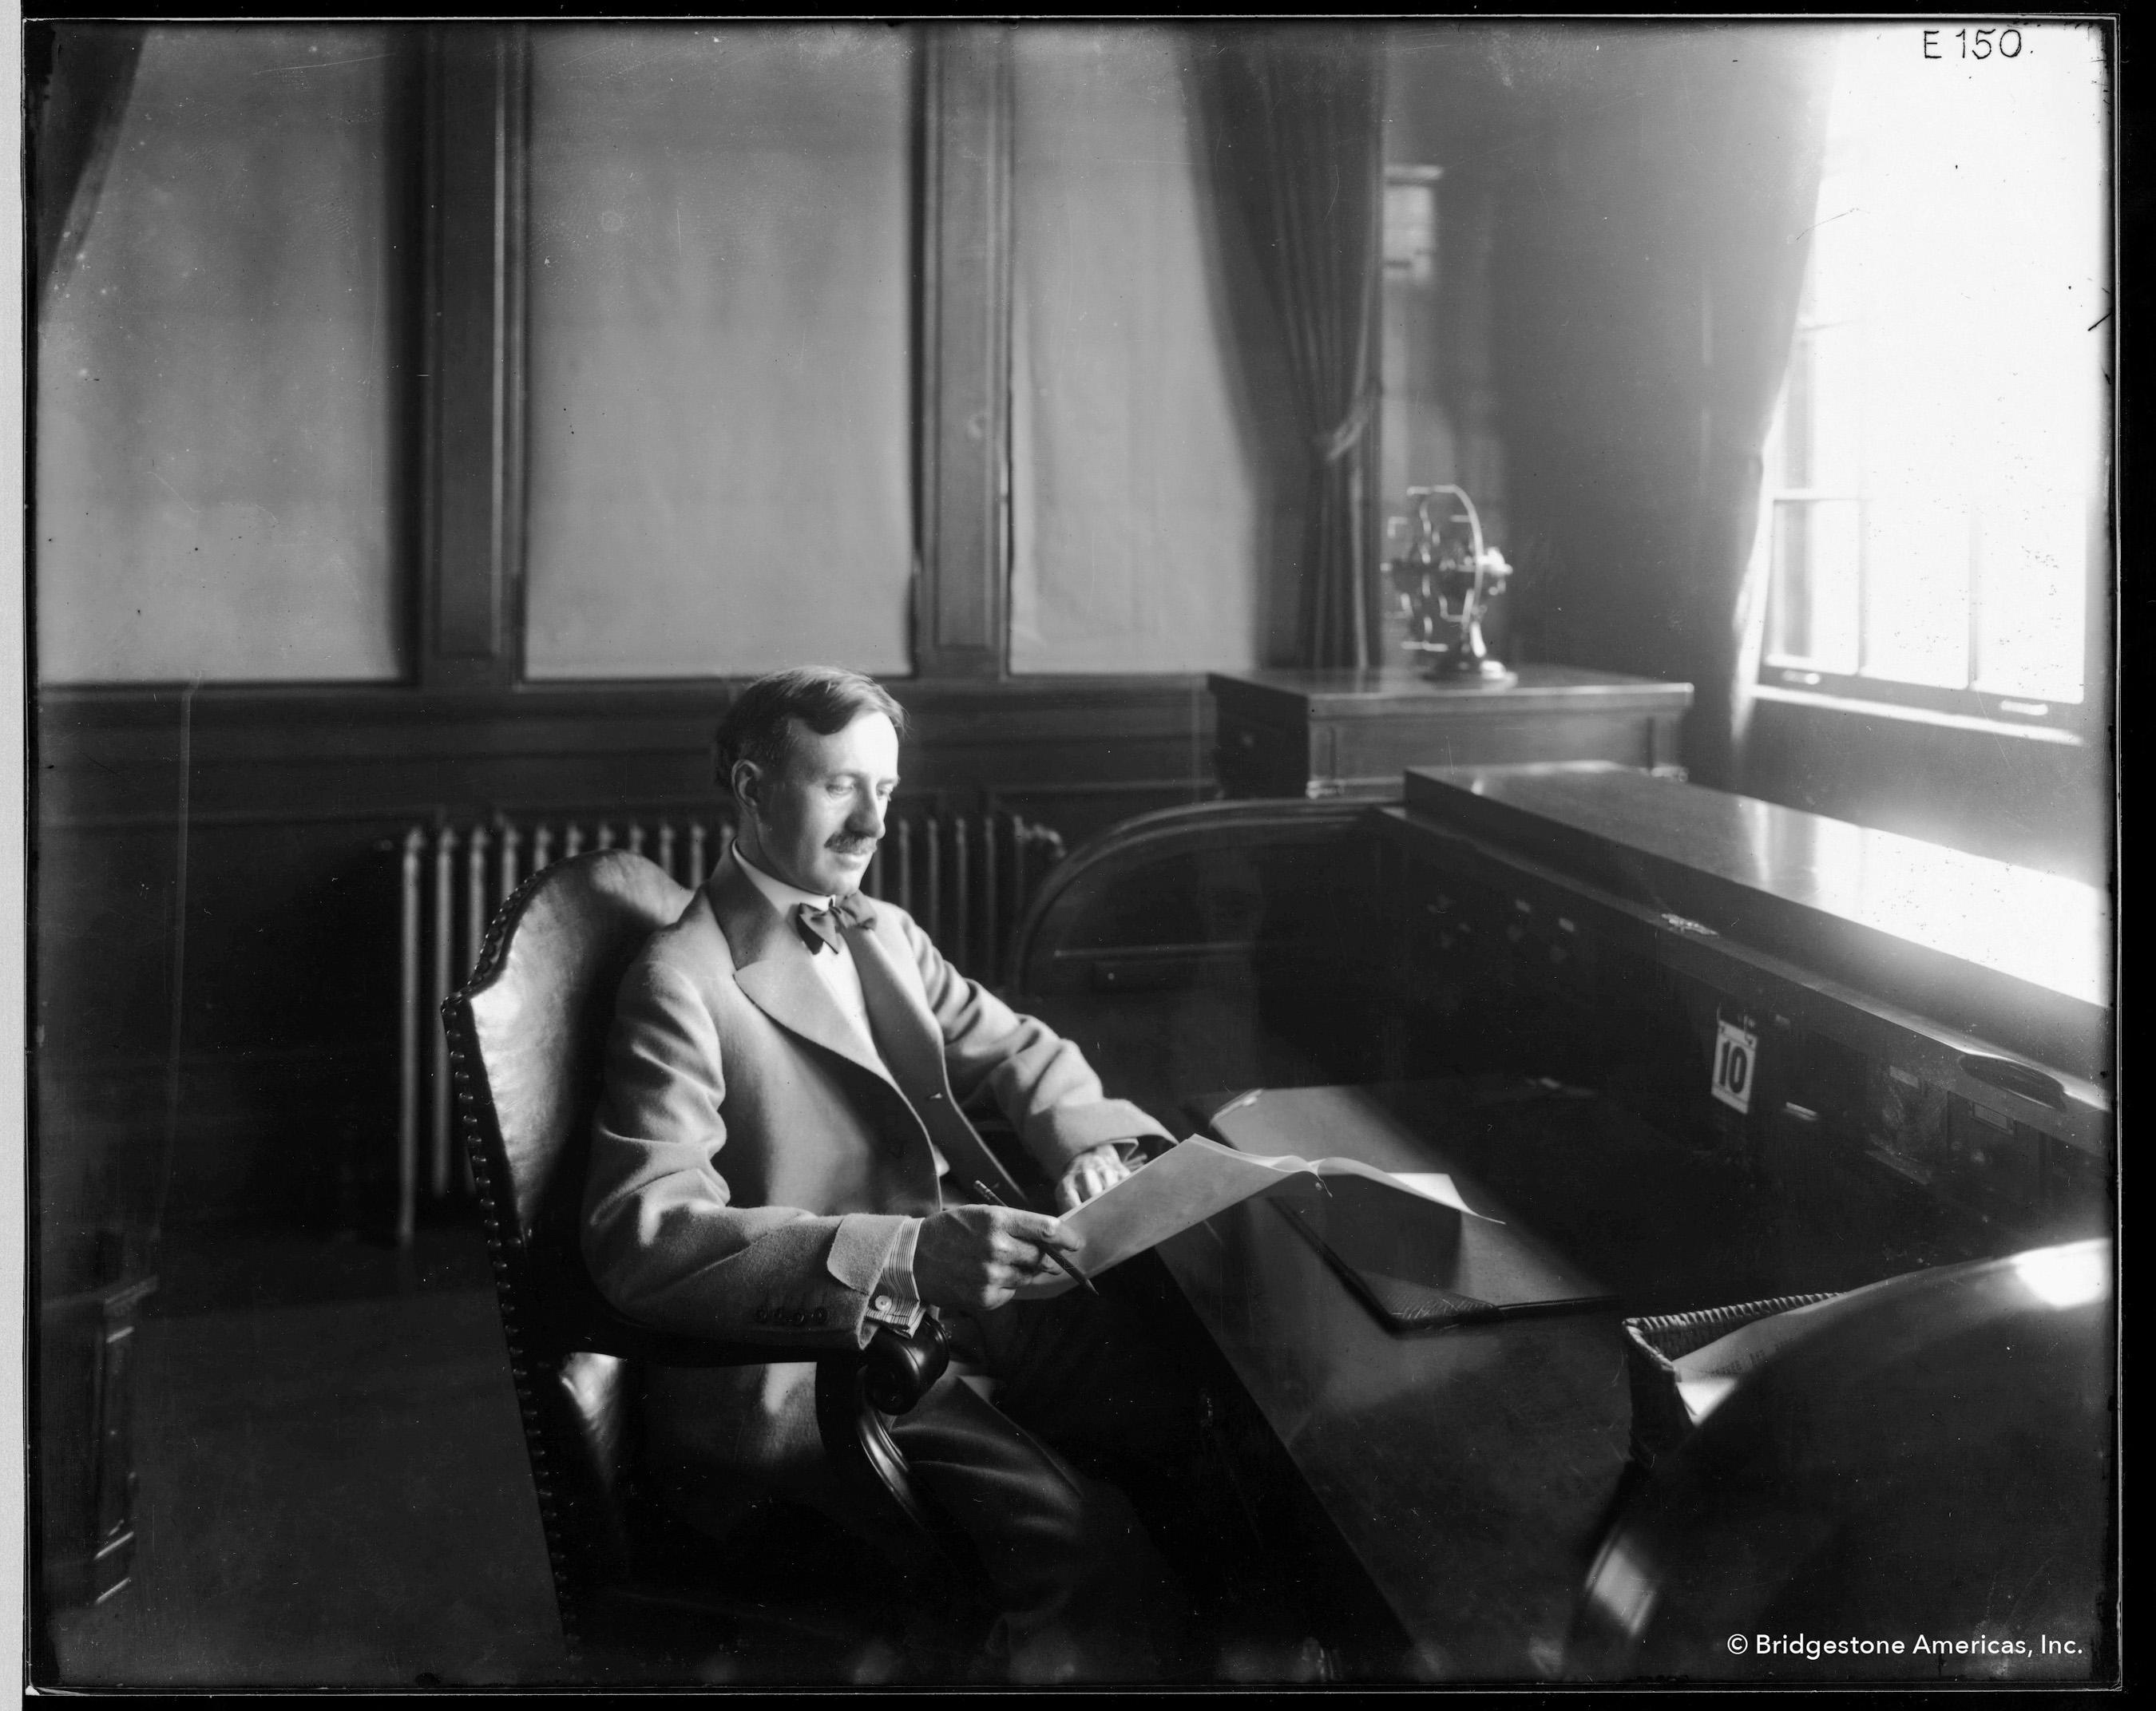 Harvey S. Firestone at his desk, date unknown.